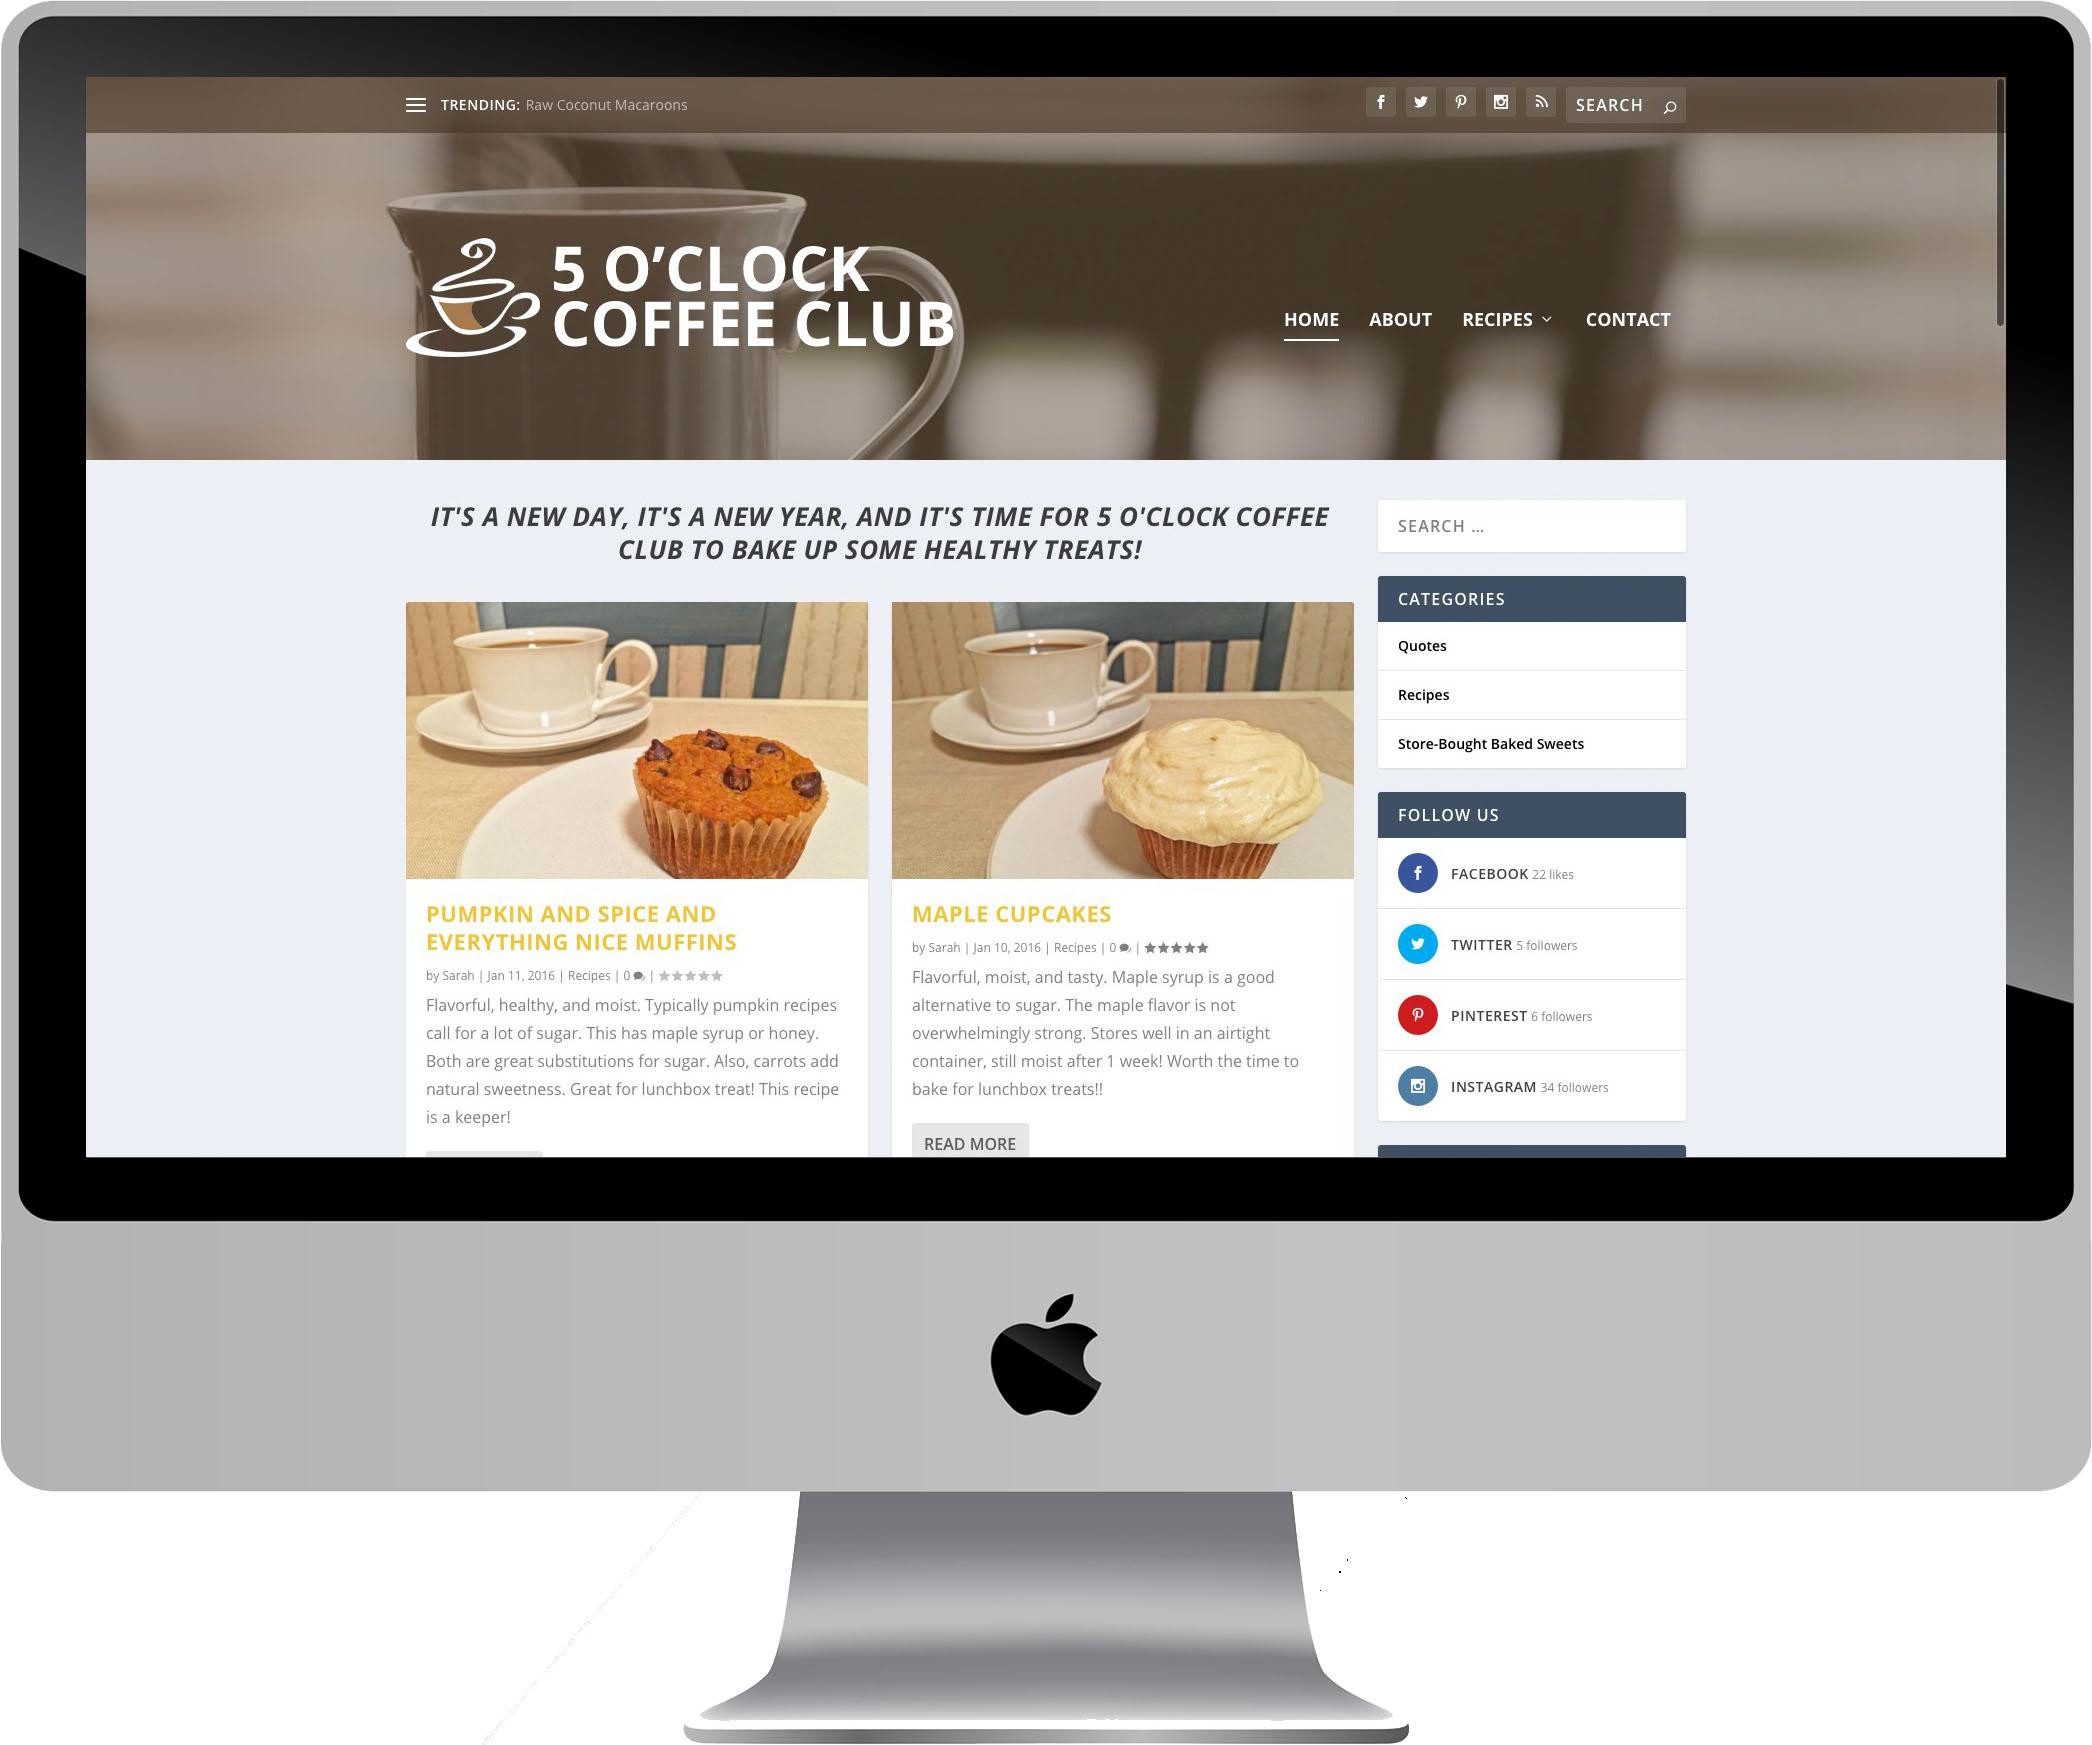 5 O'Clock Coffee Club Website Design on a Desktop